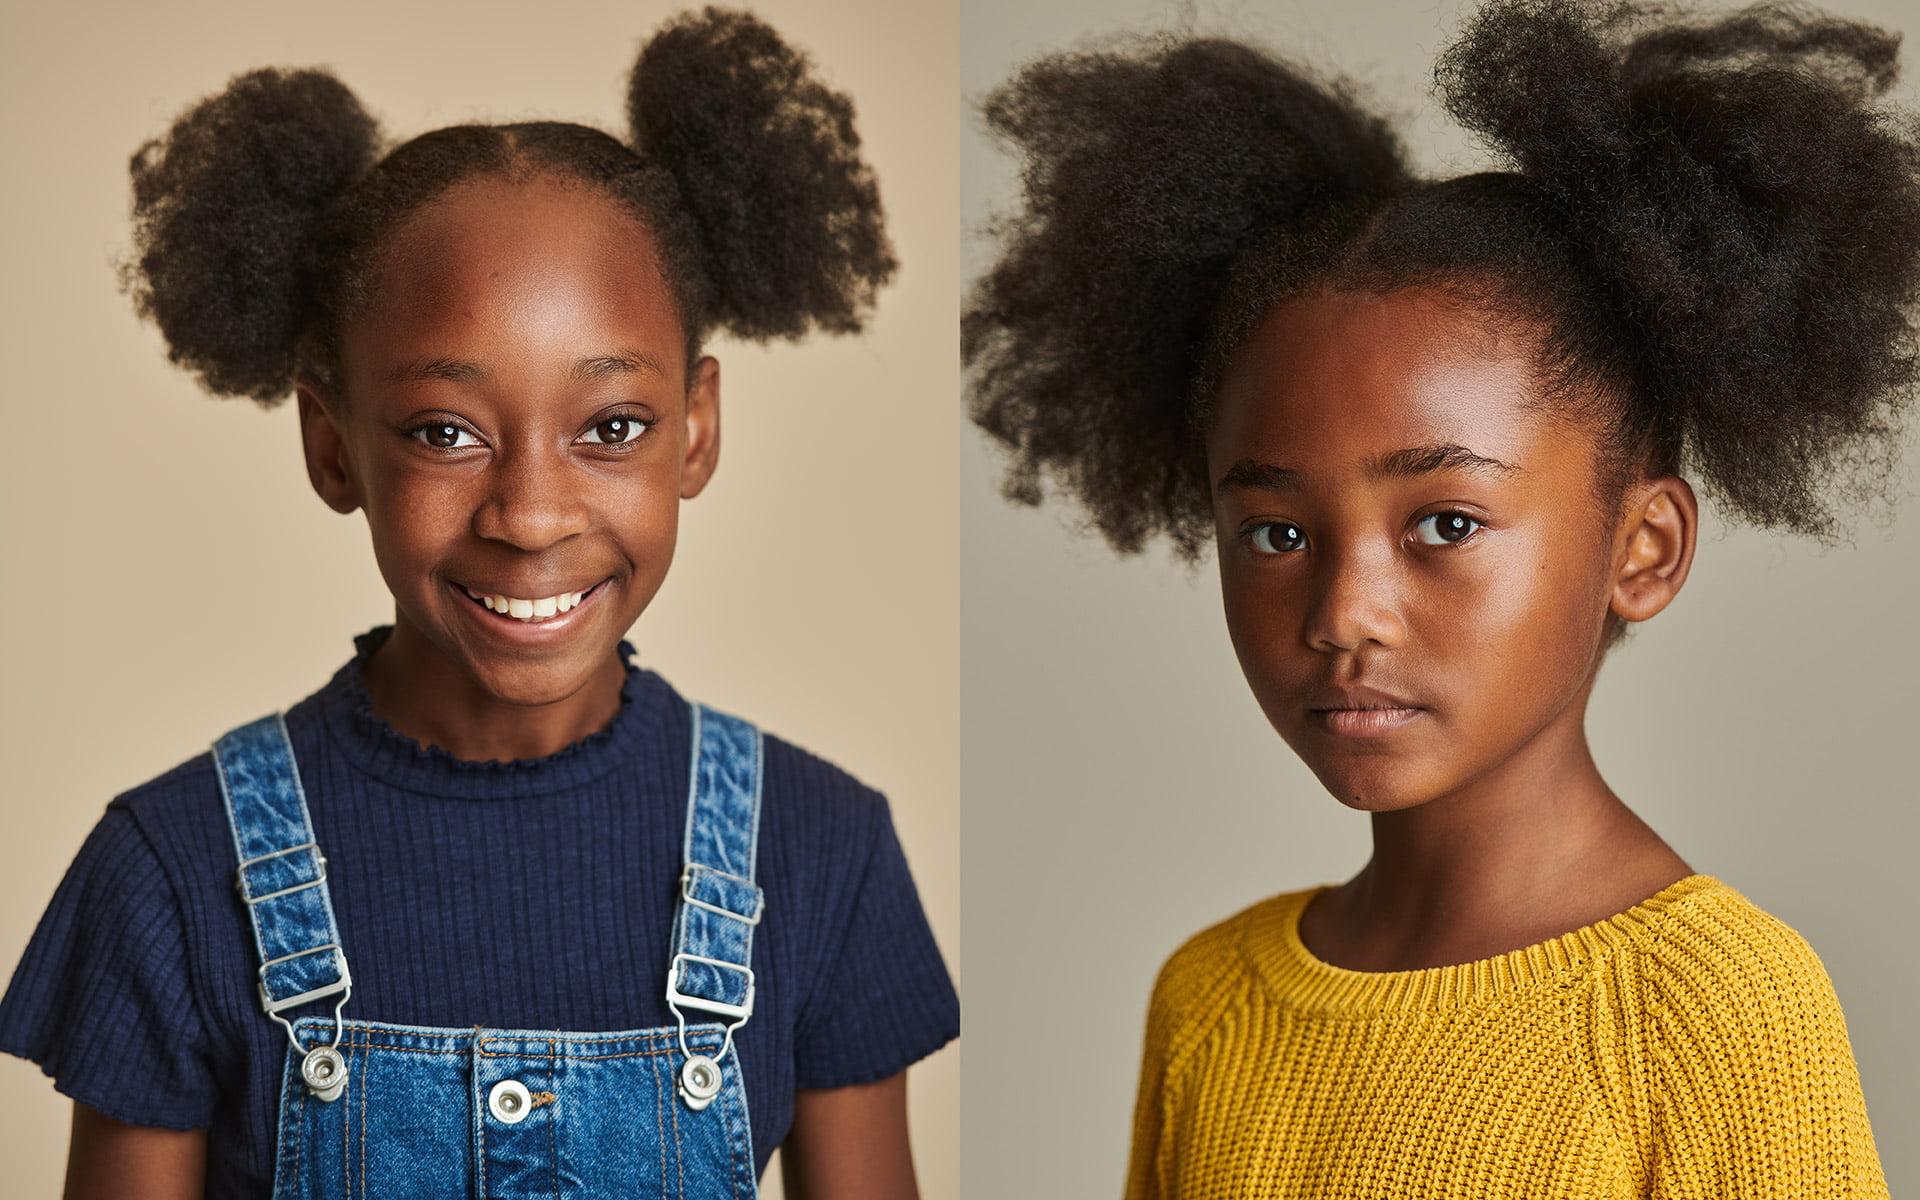 kids_actors_photographer_headshot_brighton